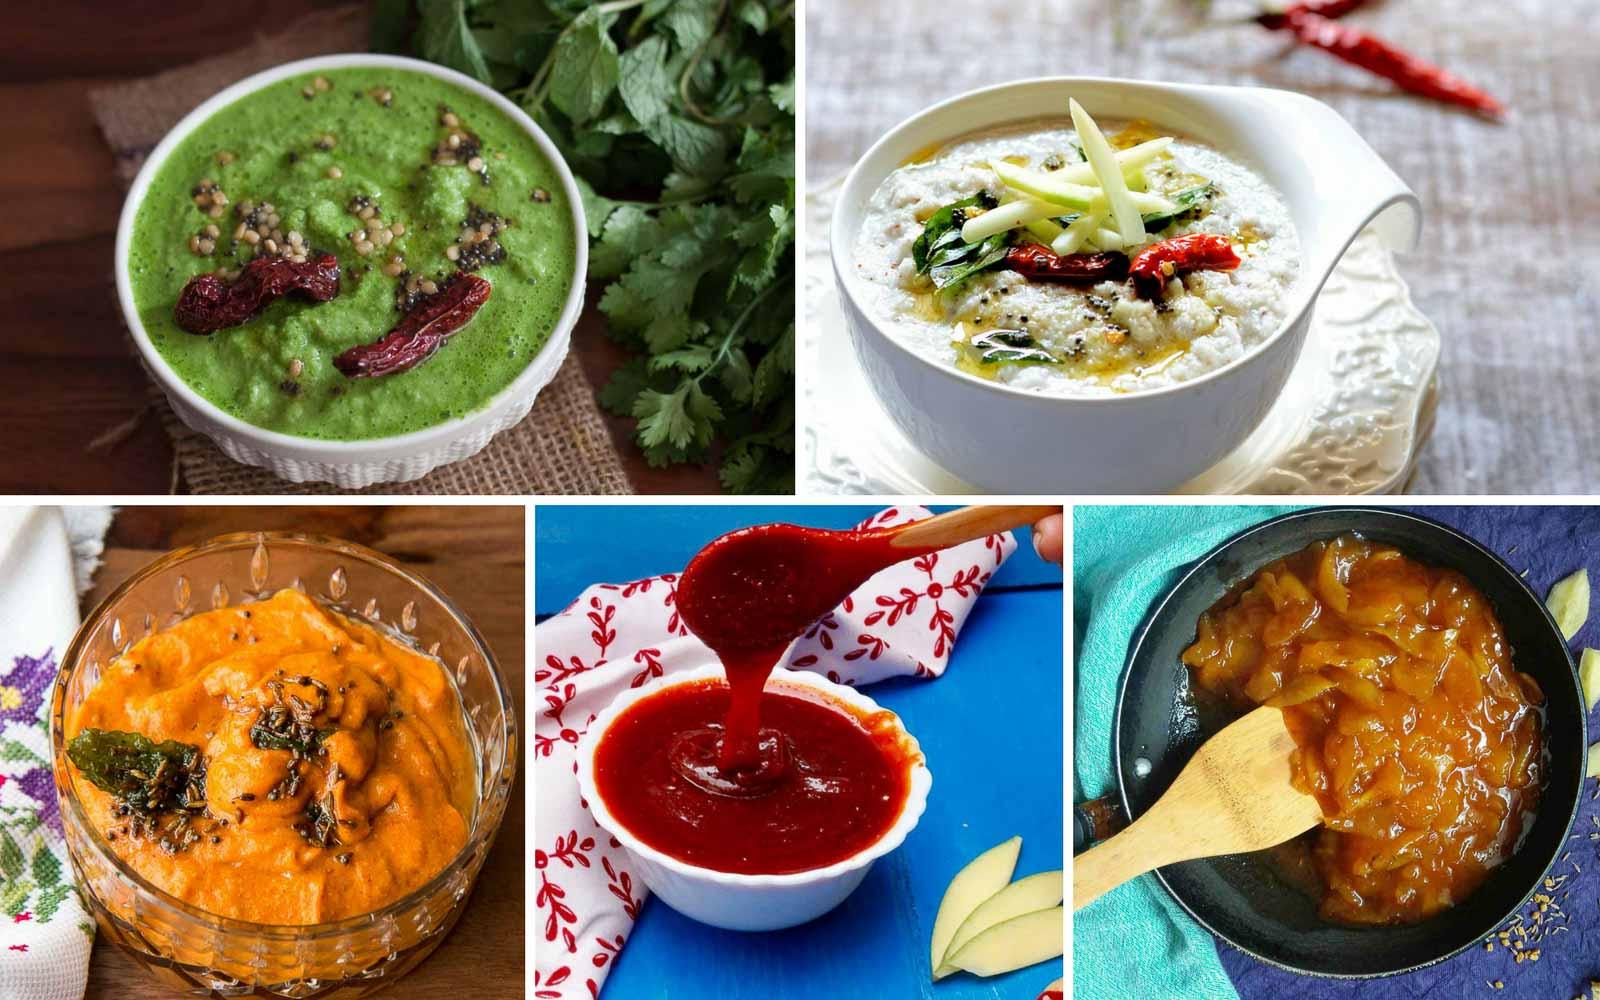 12 Interesting Raw Mango Chutney Recipes To Make This Summer